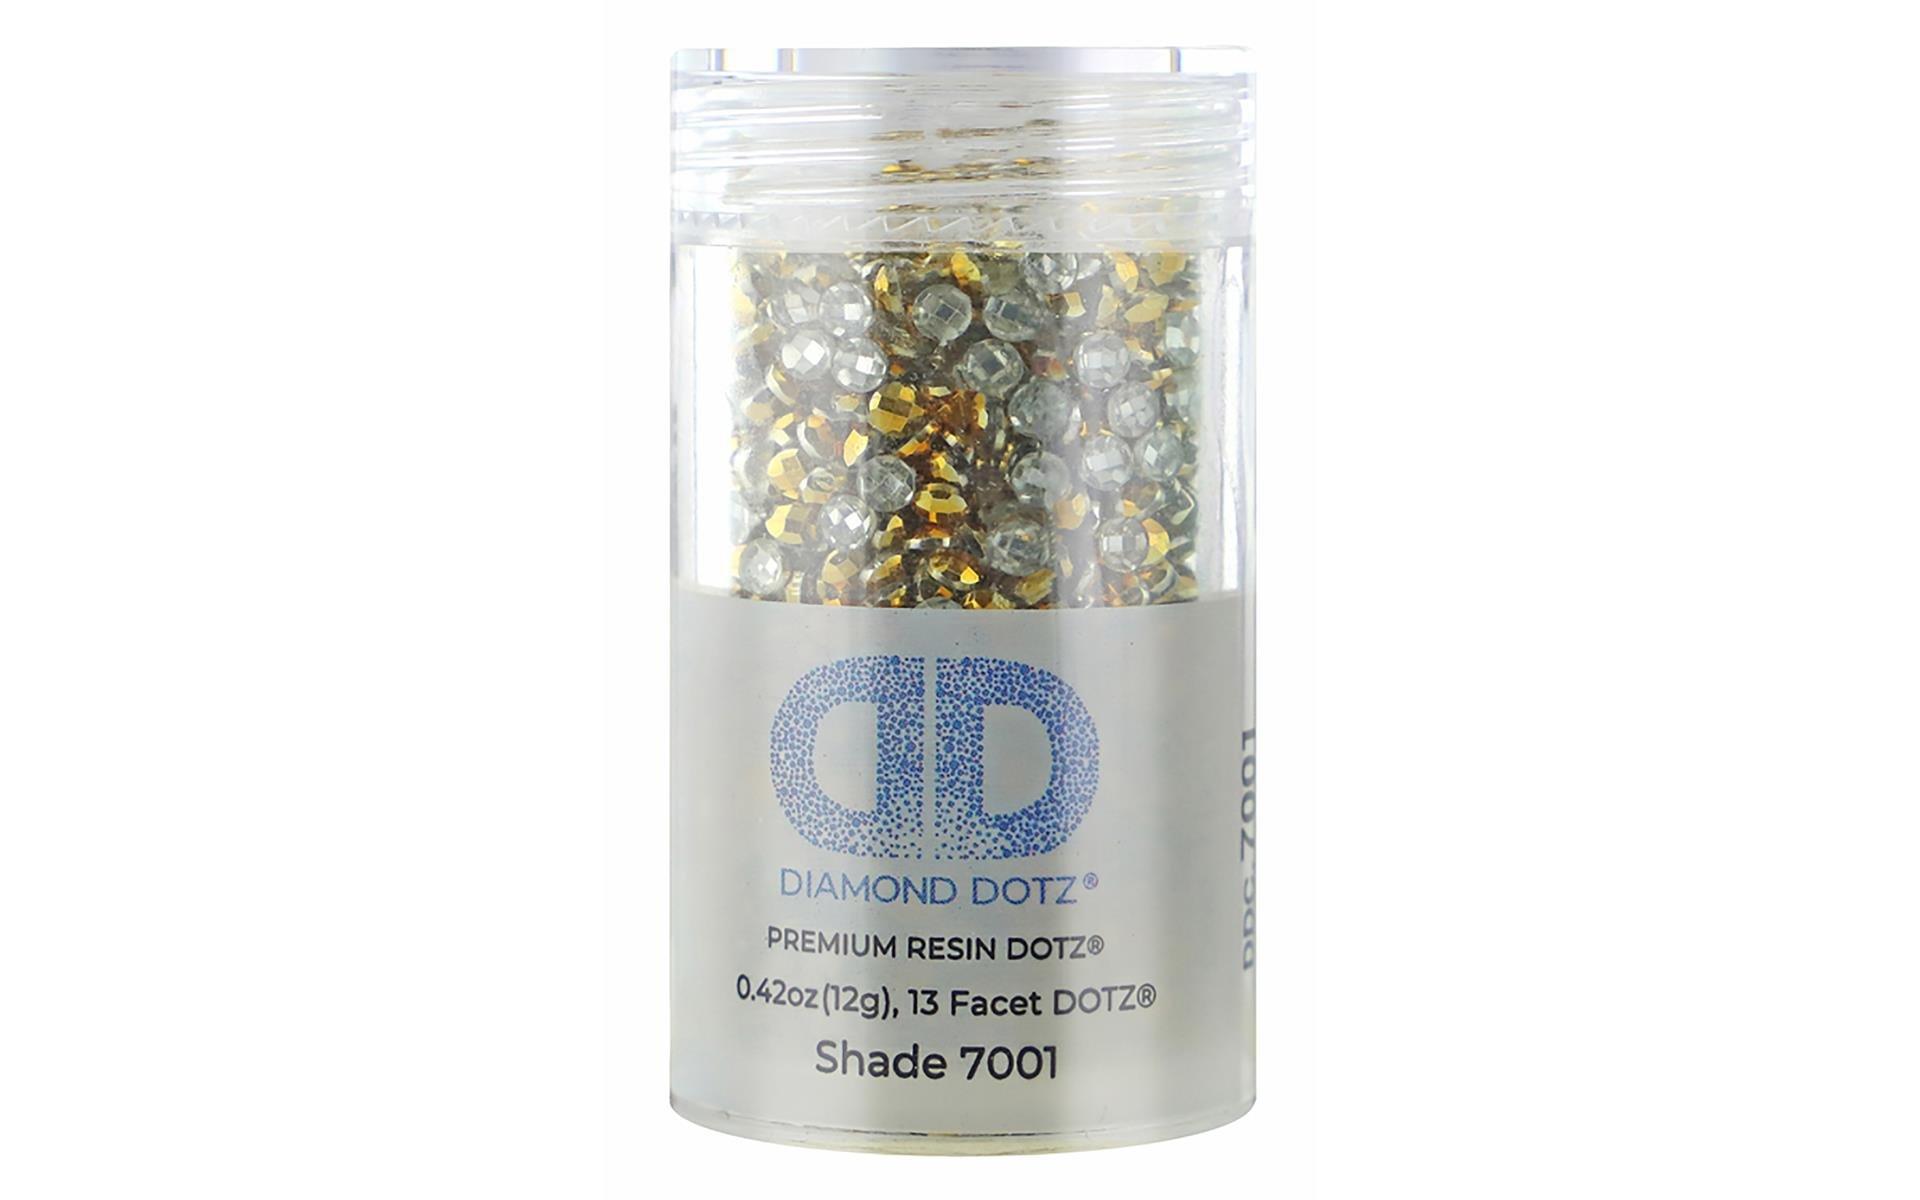 Diamond Dotz Freestyle Gems 2.8mm 12gm Metallic Red Gold